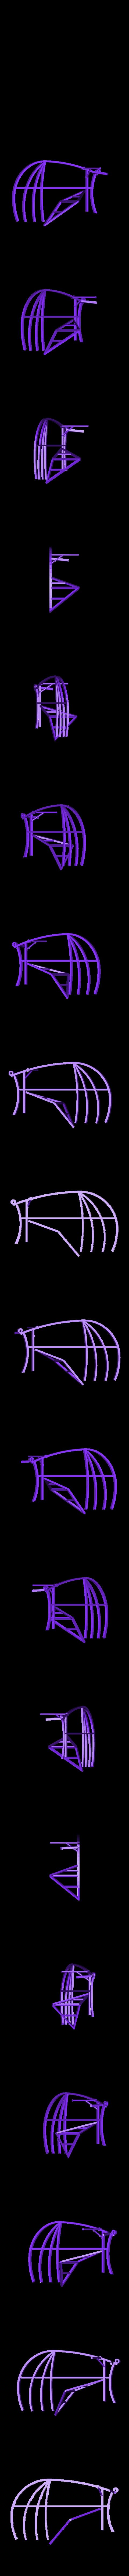 Glider_WR_tail.stl Download free STL file Leonardo Da Vinci - Ornithoper • Design to 3D print, Slagerqod